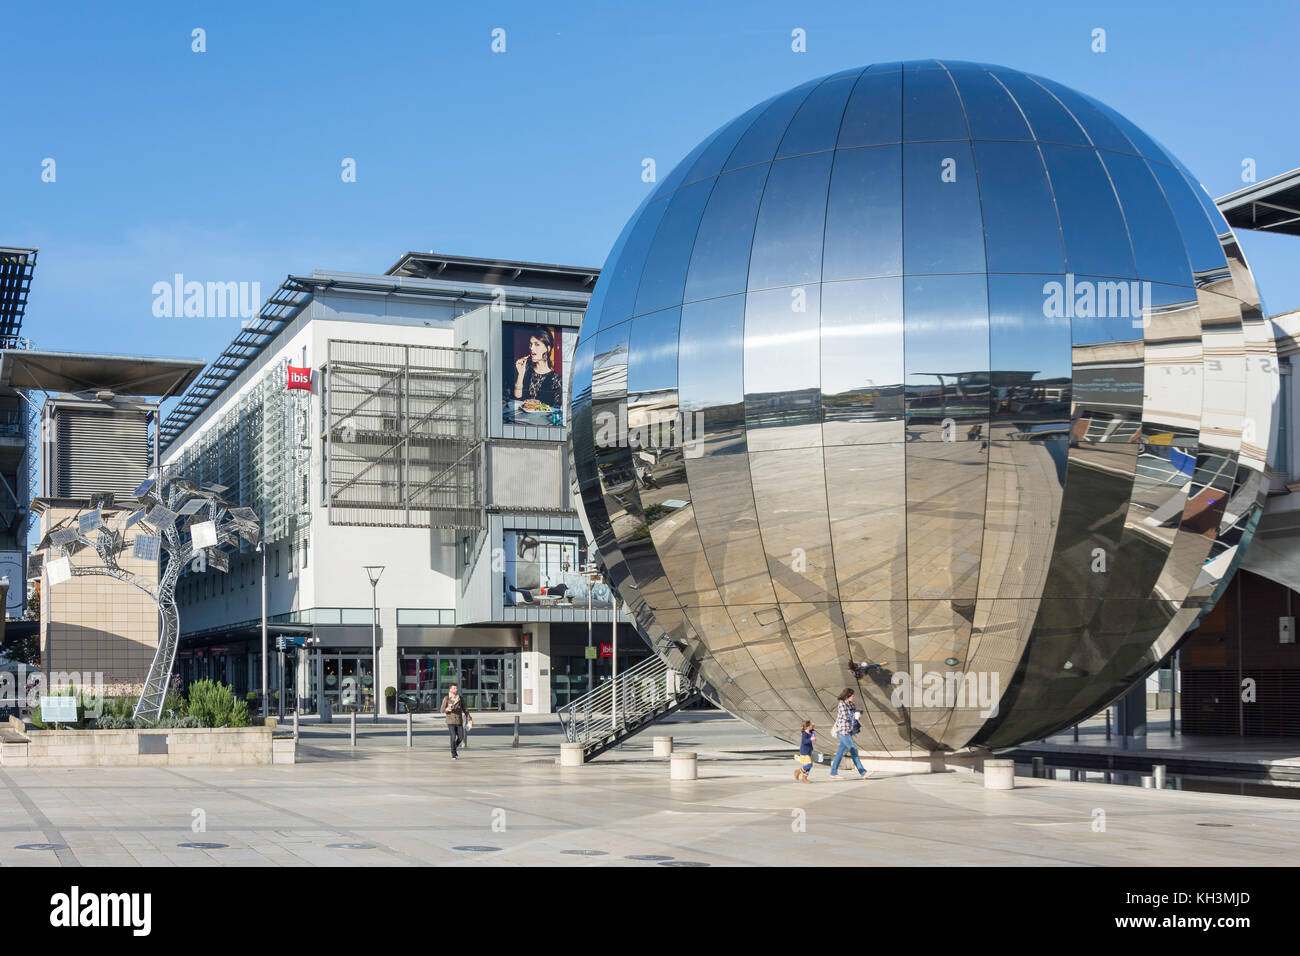 Mirror Globe in Millennium Square, Harbourside, Bristol, England, United Kingdom - Stock Image